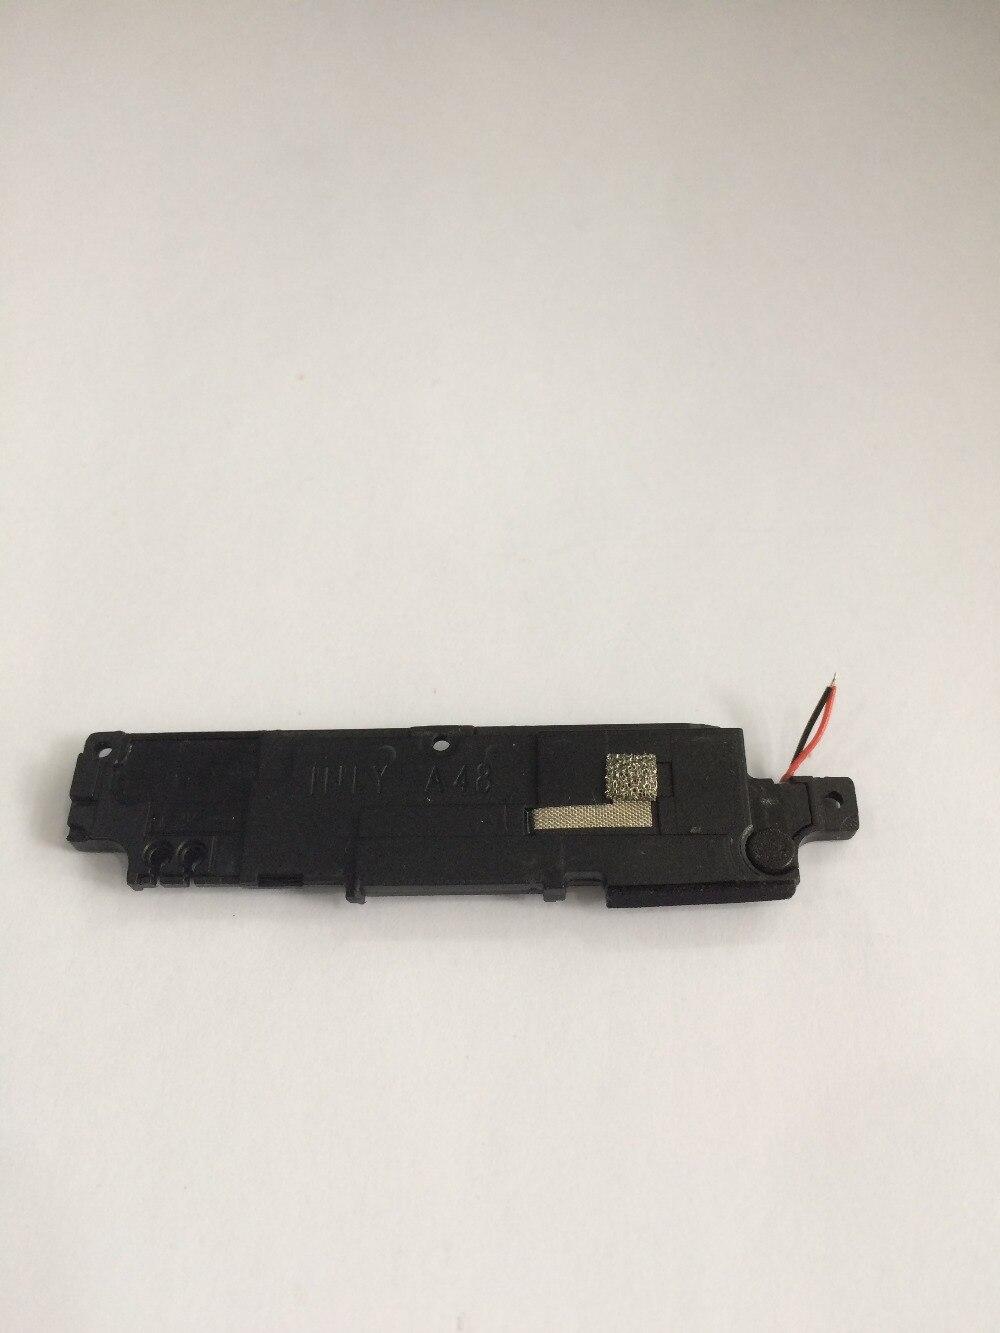 how to open the door buzzer from home phone number